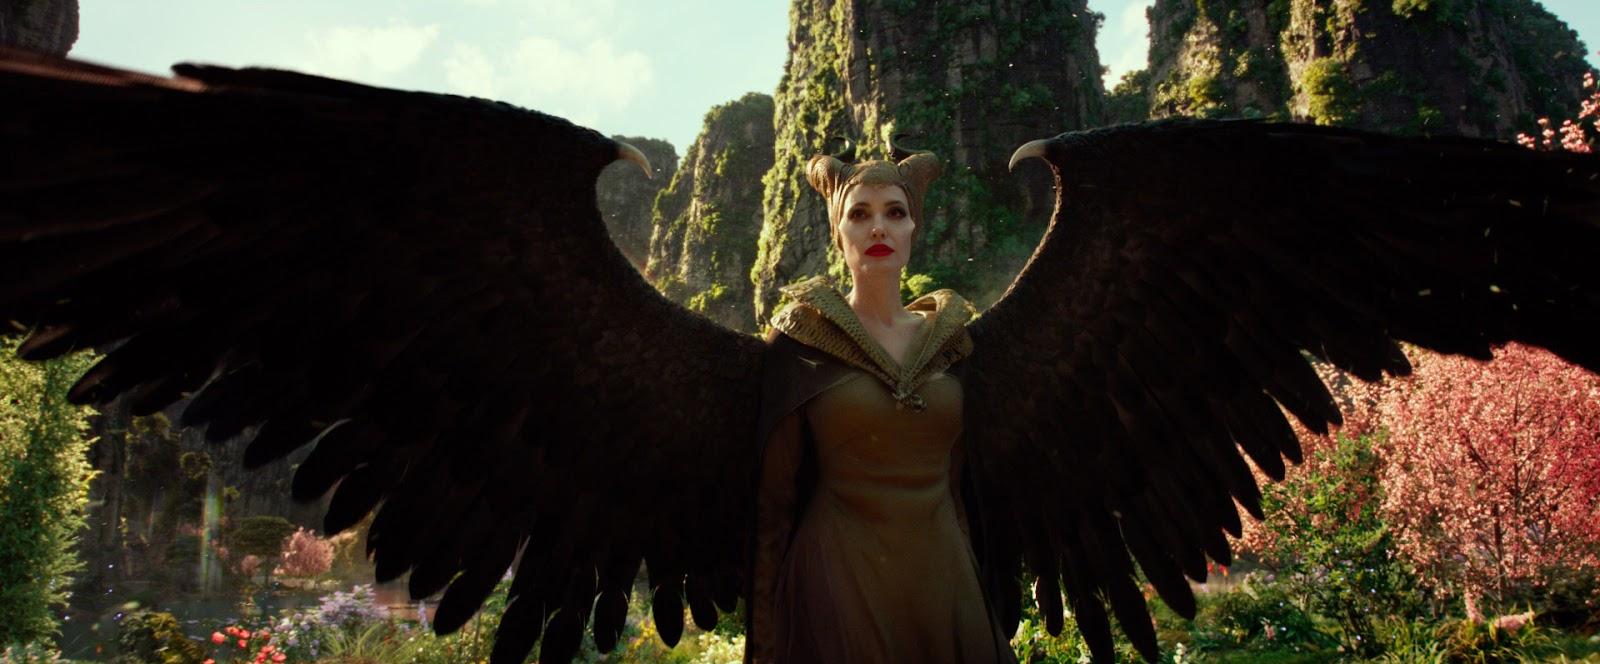 30 Days Of Disney Why I Am Rewatching Maleficent